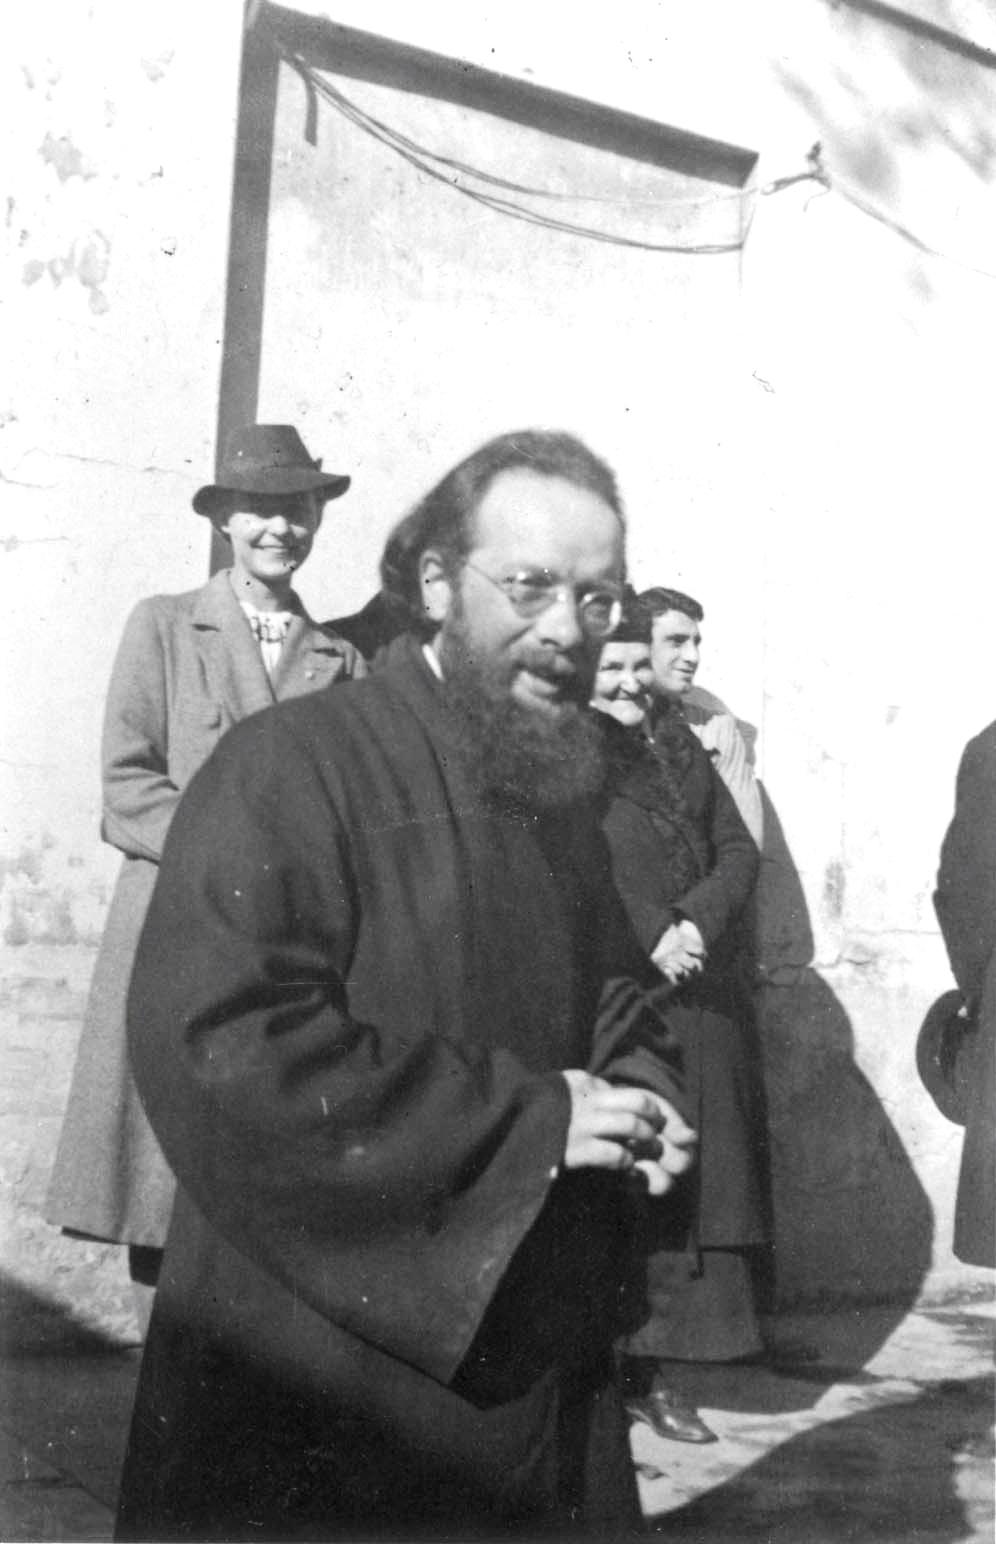 Hl.Dimitrij Klepinin, Priester in der Kirche in Rue  du Lourmel, gestorben in der KZ Dora, nahe Ravensbrück, heiliggesprohen 2003